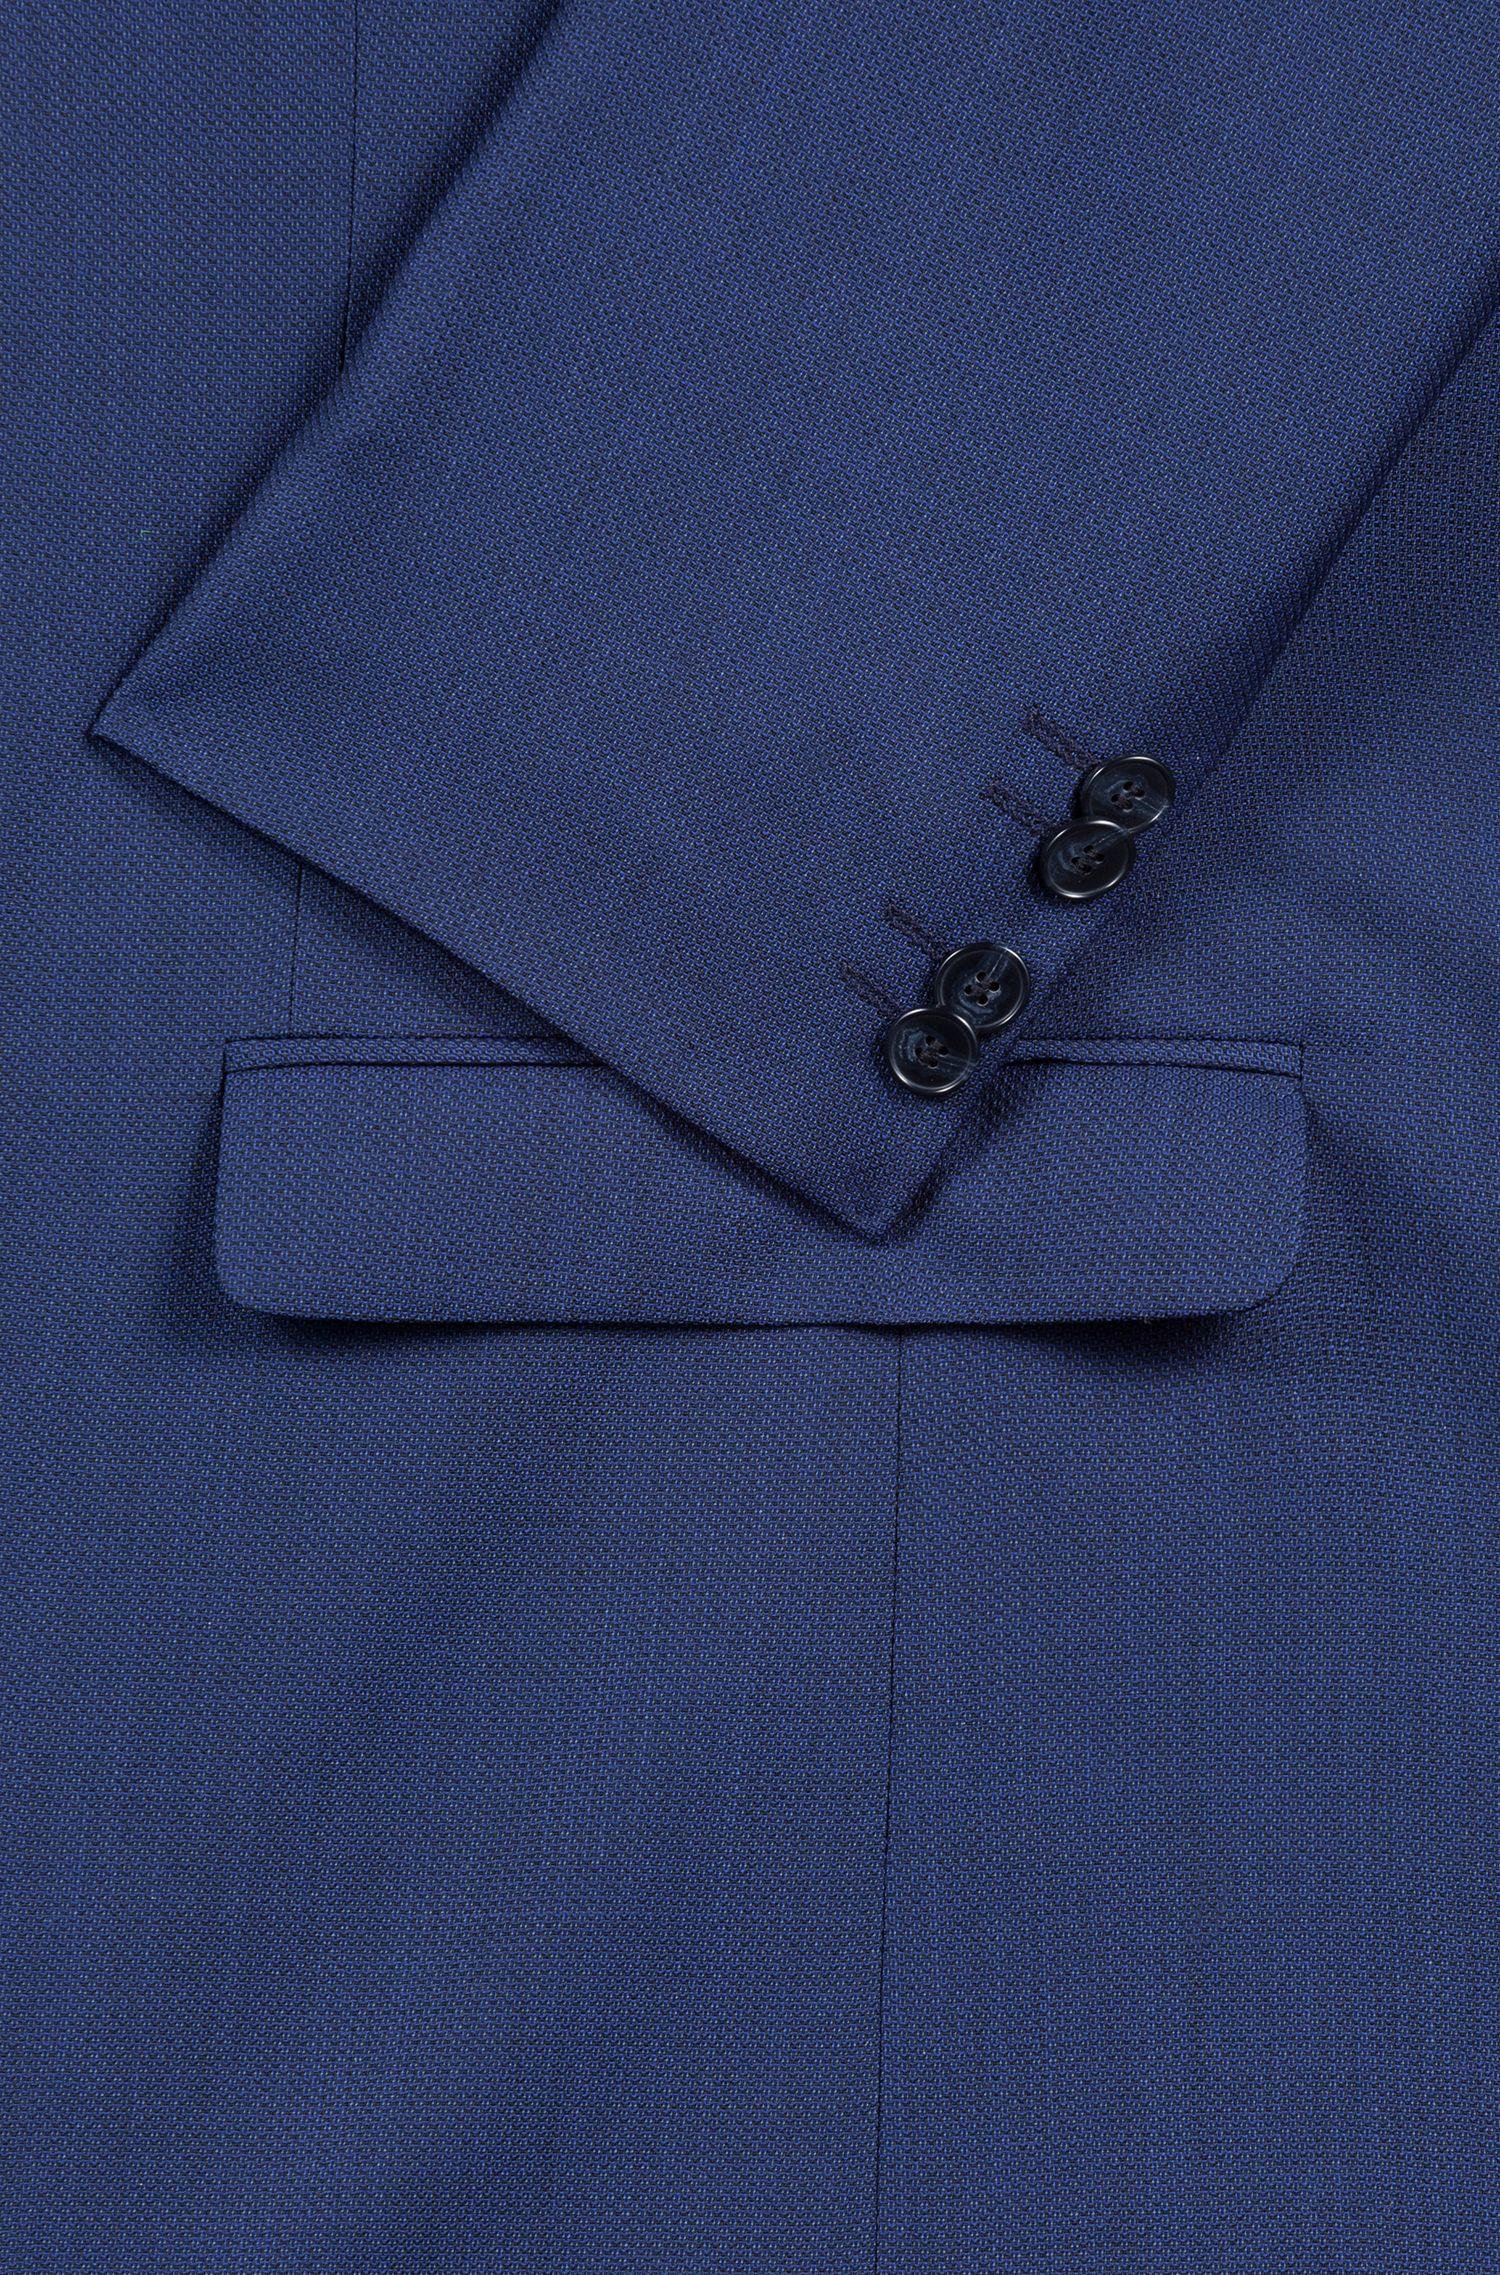 Blazer extra slim fit en lana virgen con microestructura